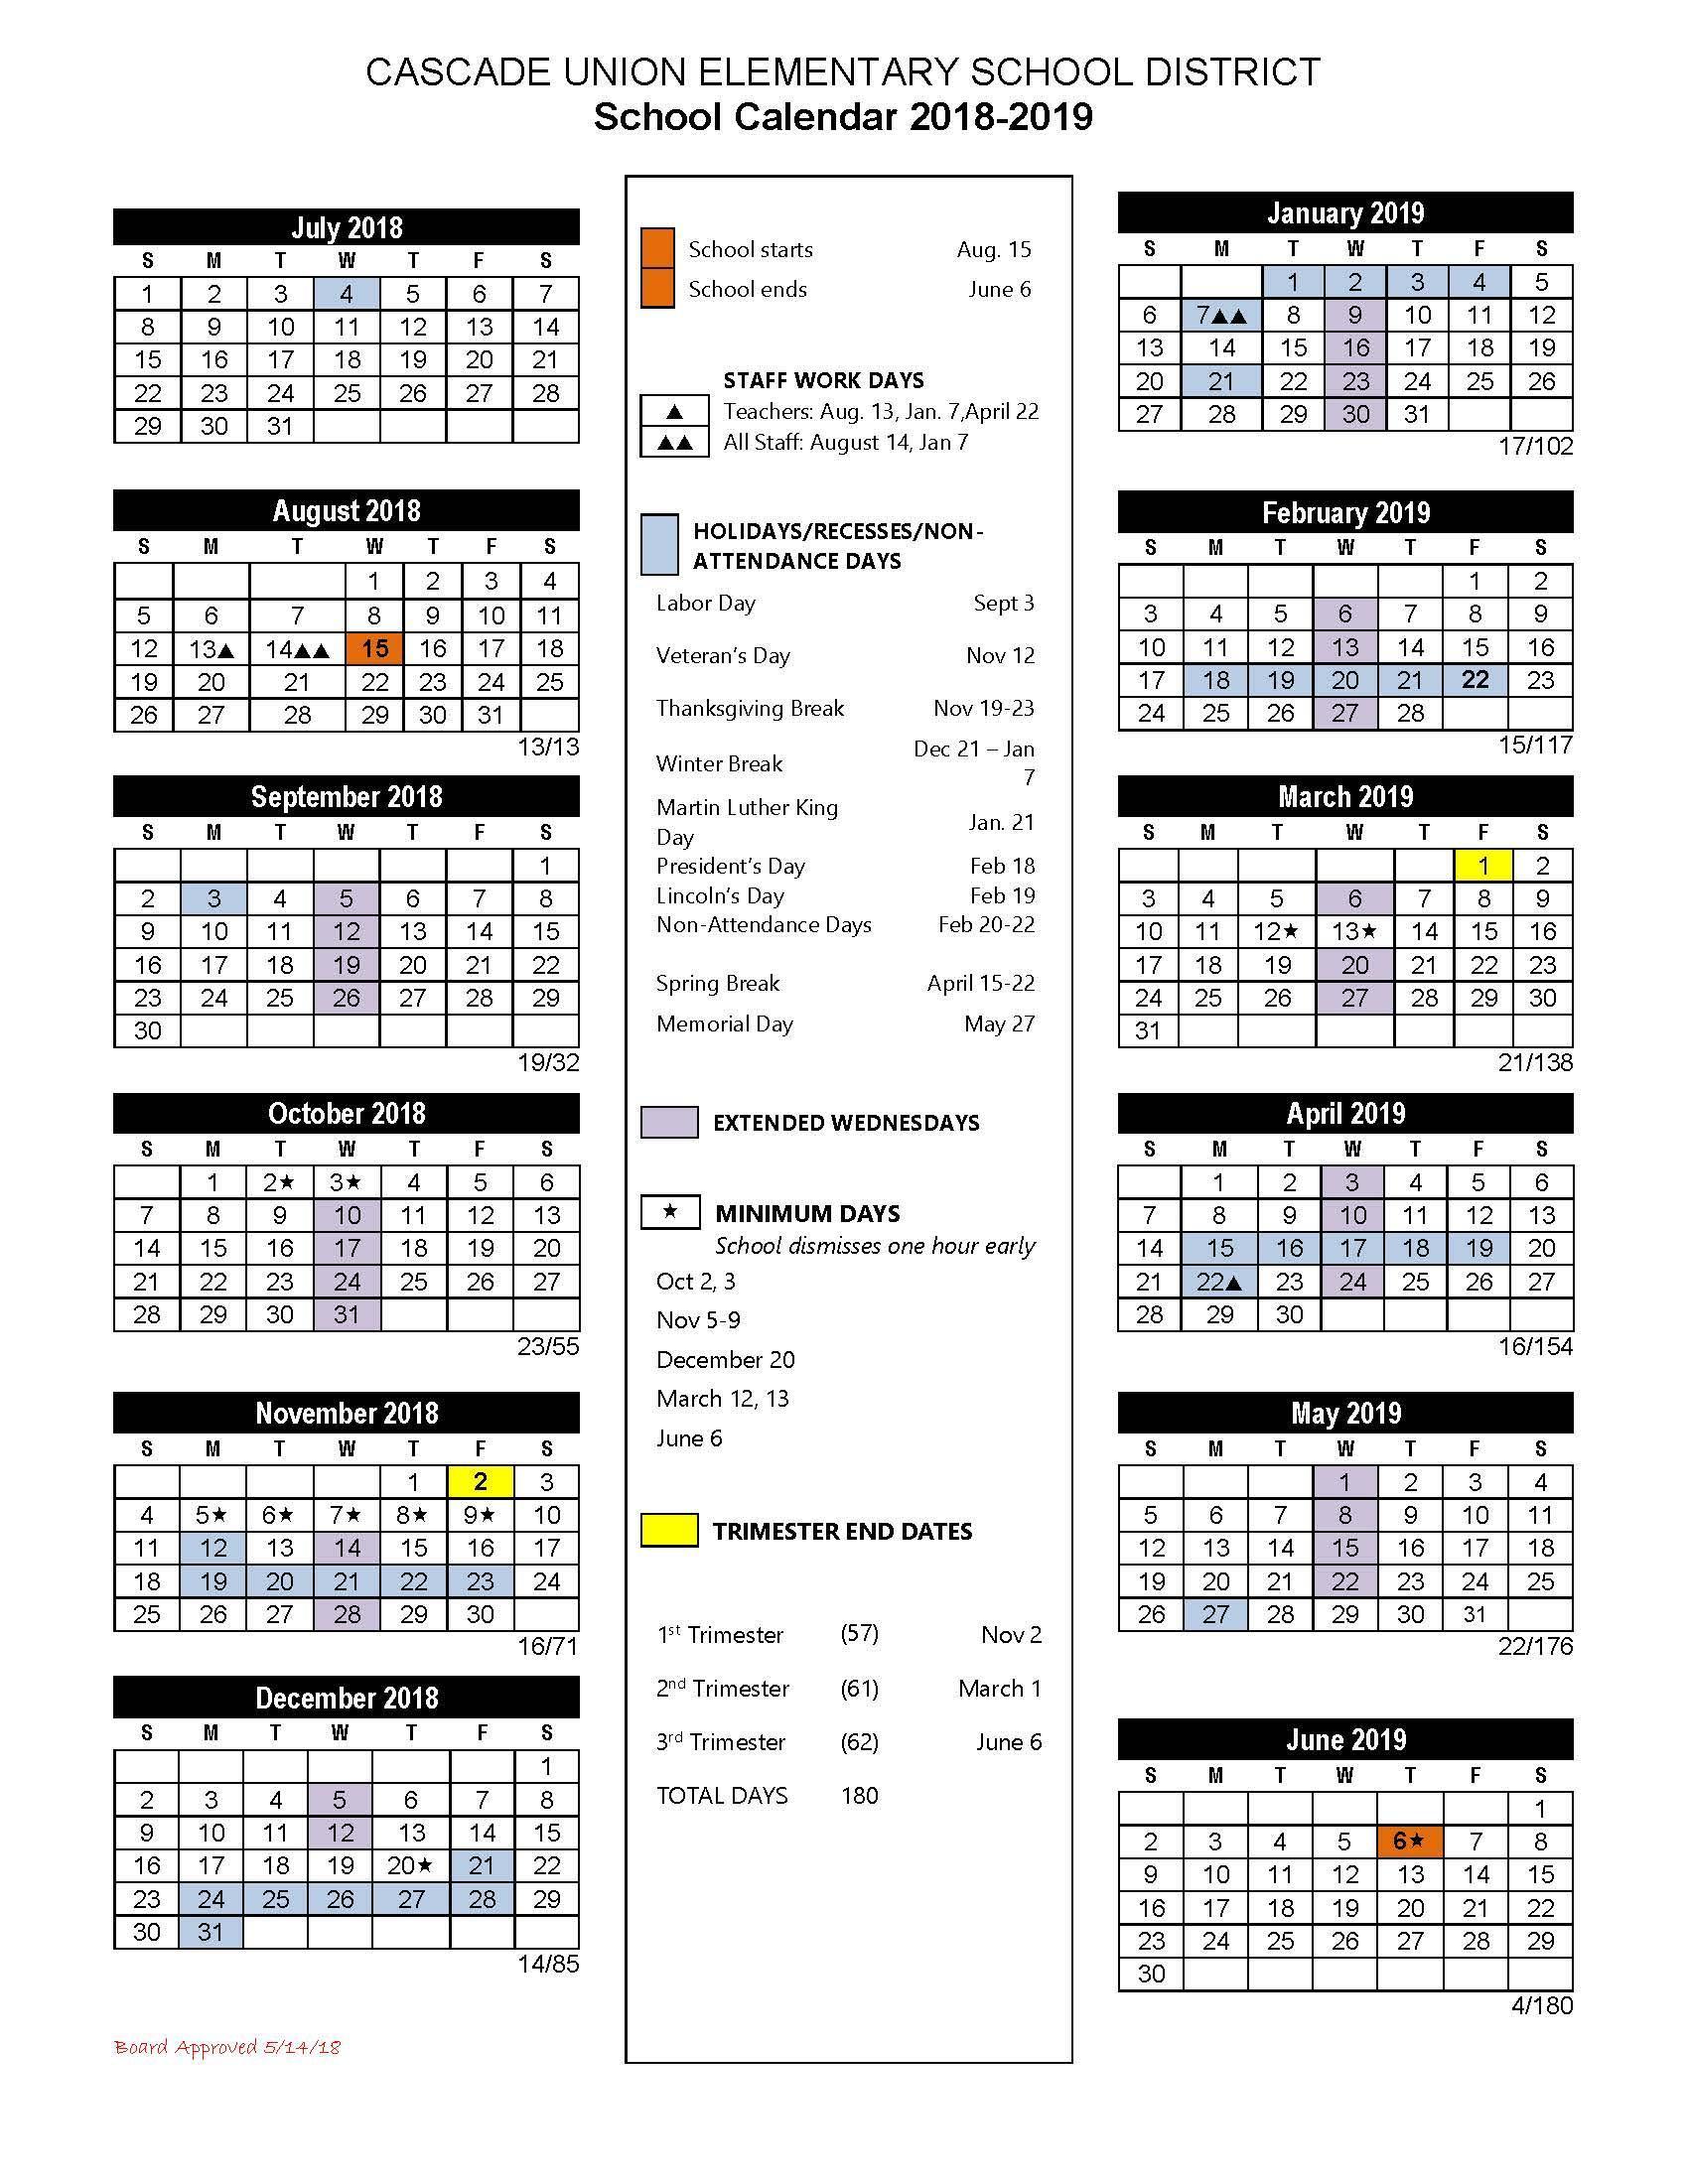 School Calendars School Calendar Cascade Union